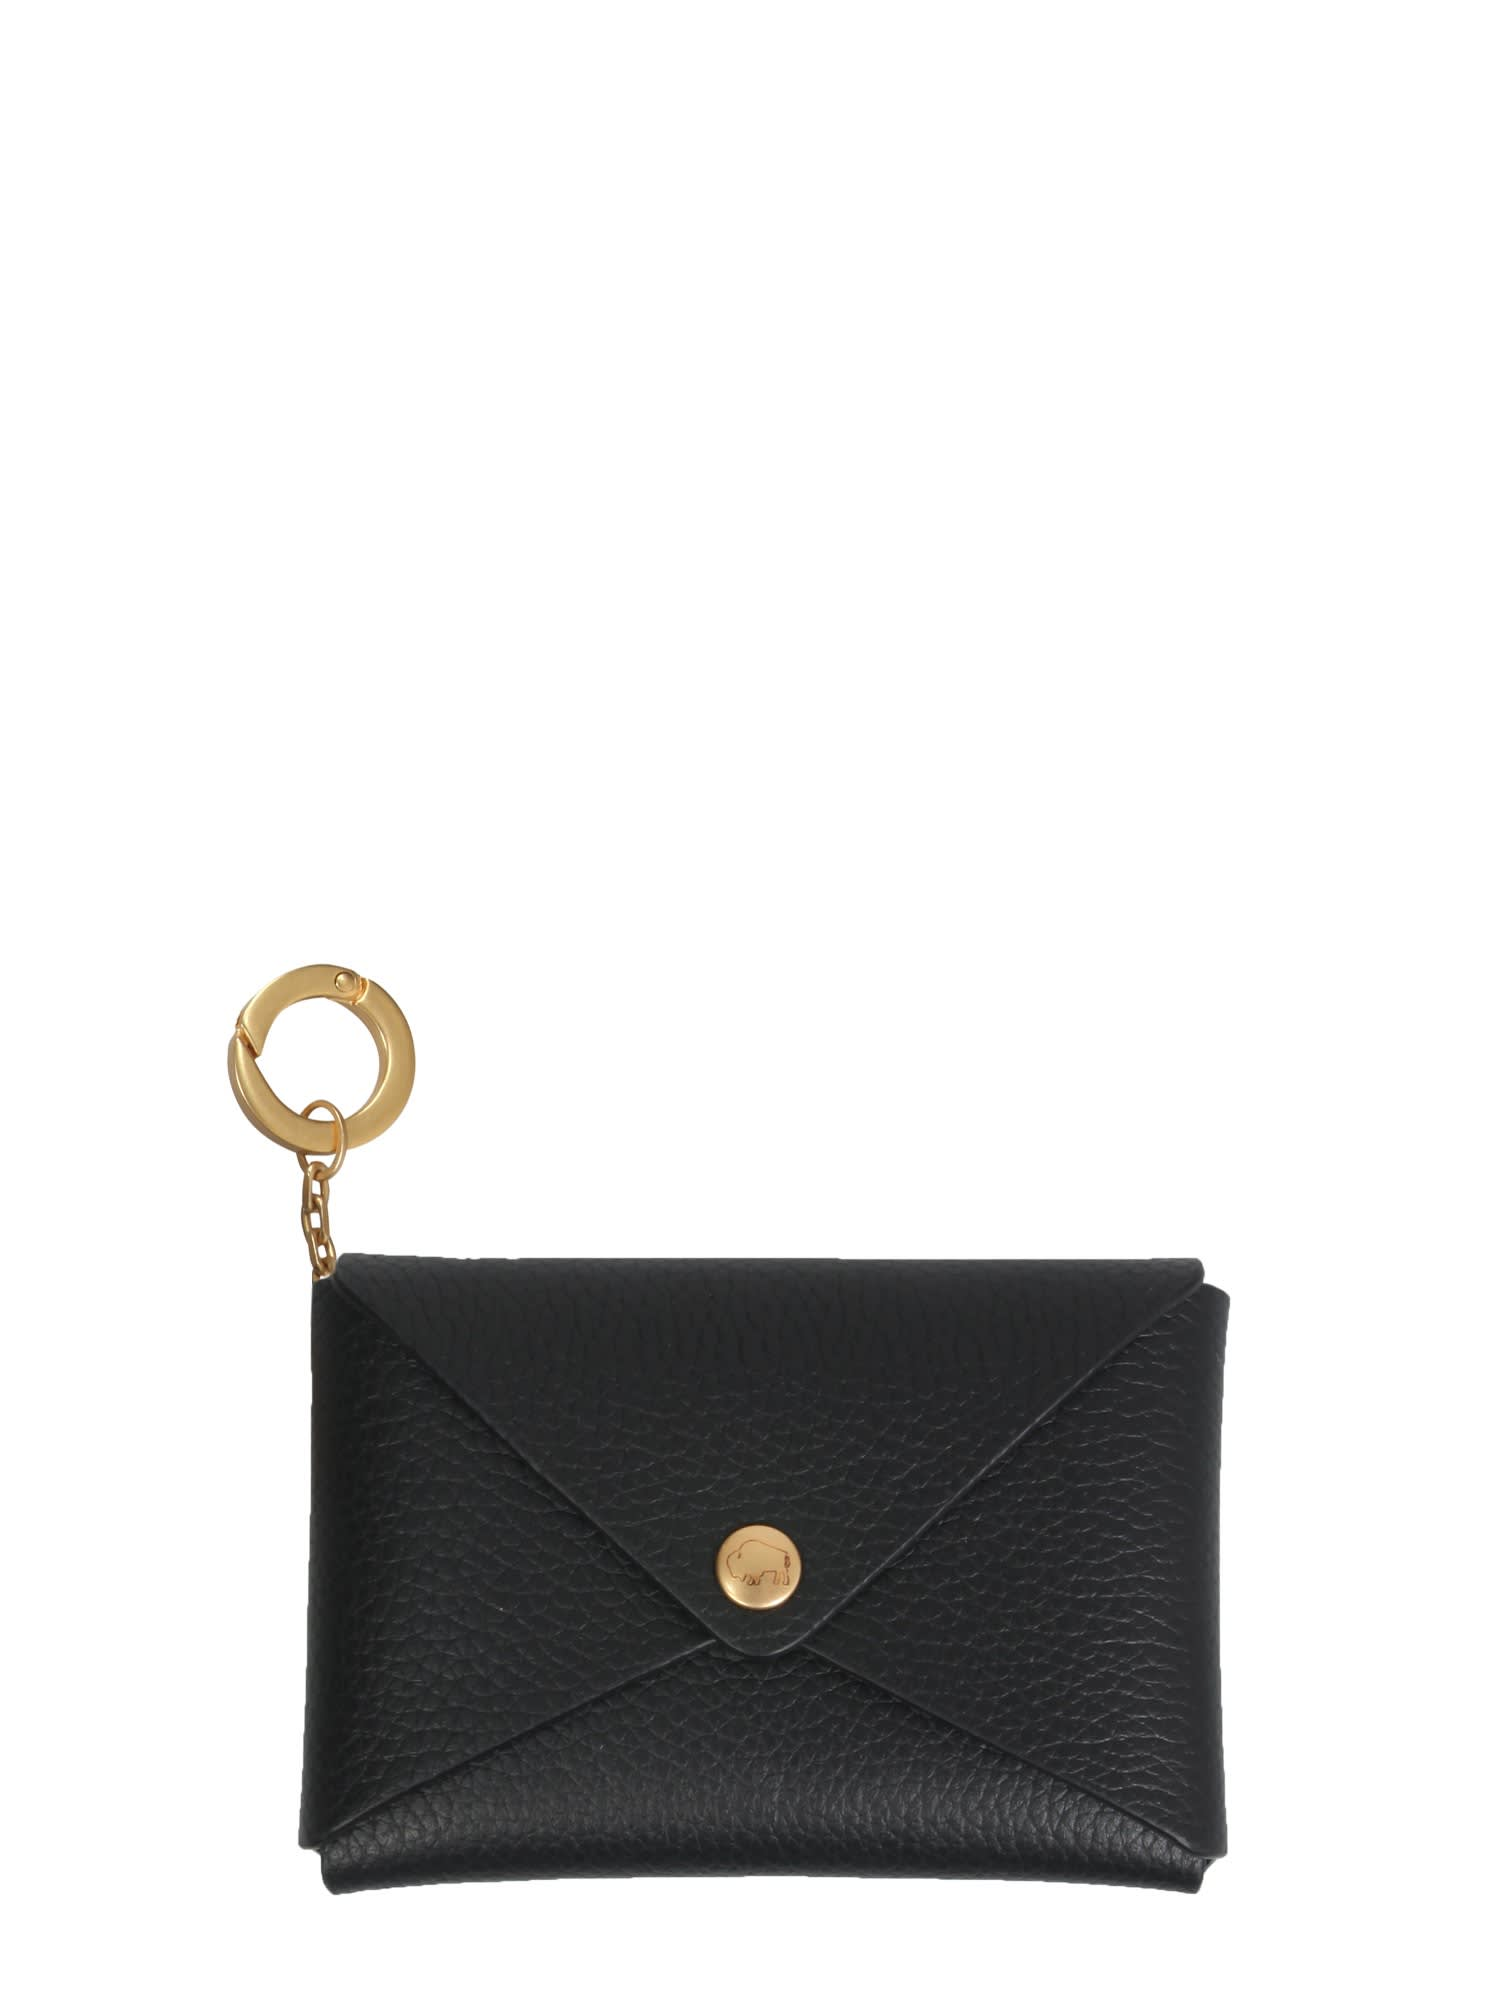 Titania Leather Envelope Card Holder